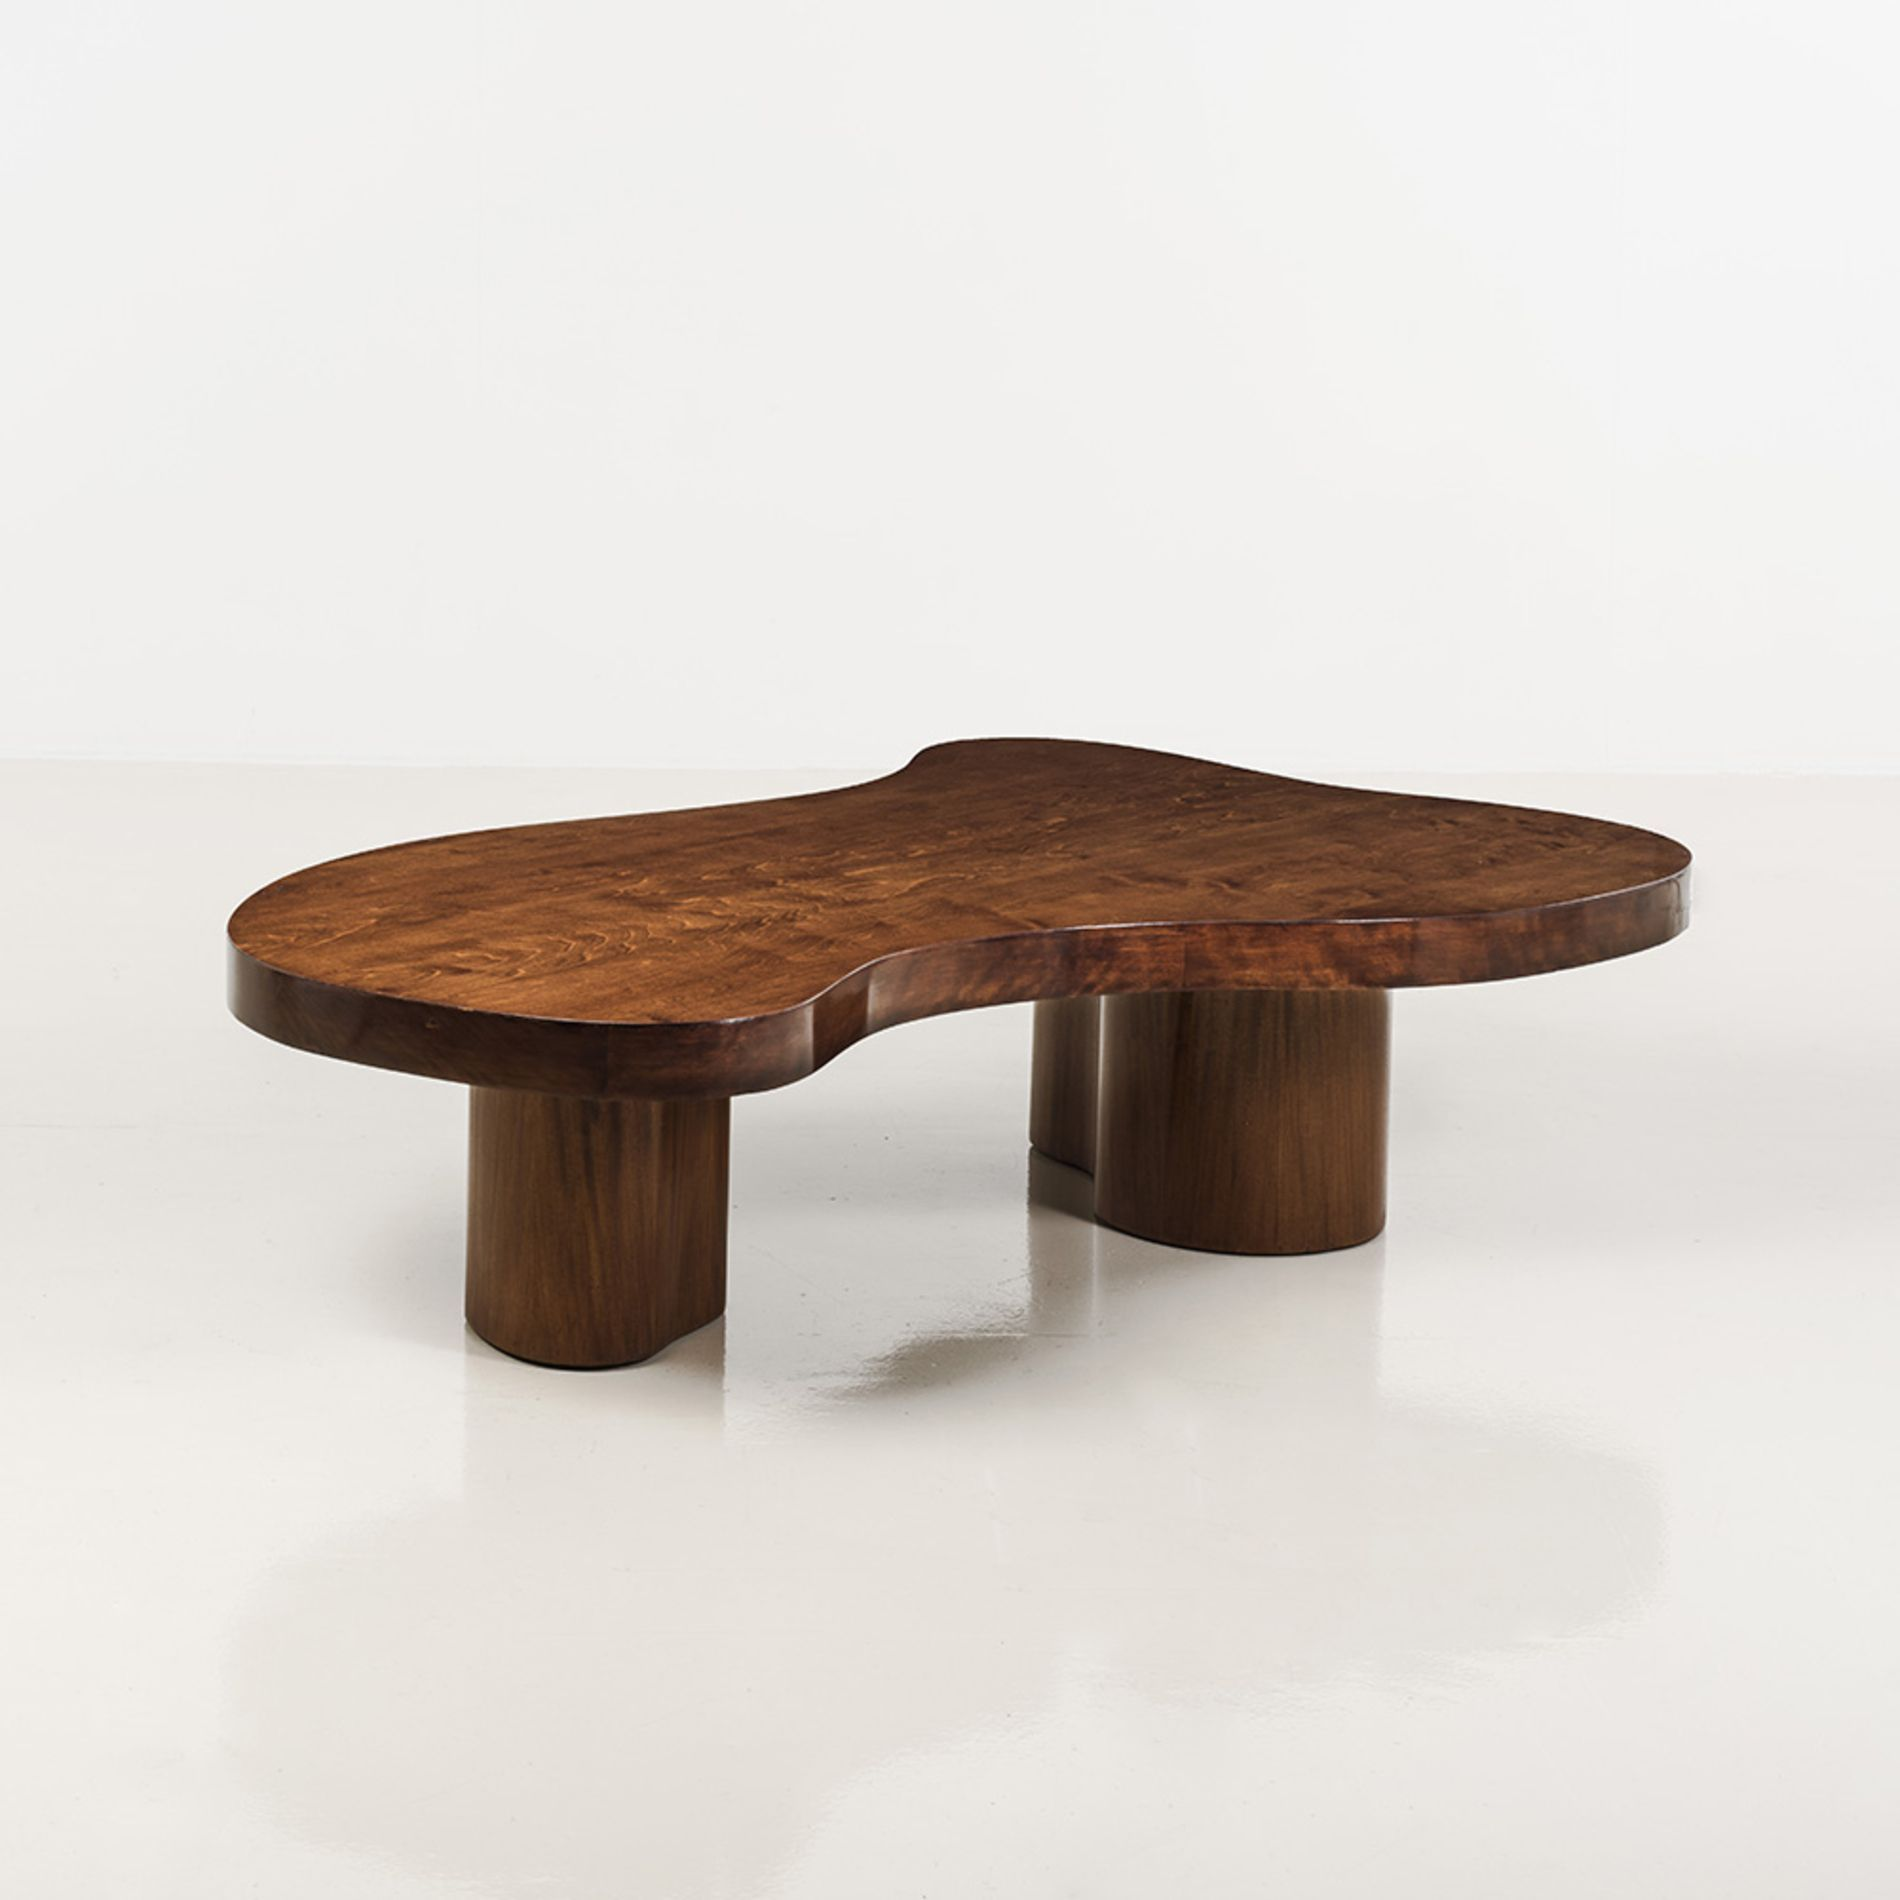 Interior Design Addict T H Robsjohn Gibbings 1905 1976 Table Basse Noyer Edition Widdicomb Date De Creation Vers Coffee Table Studio Furniture Furniture